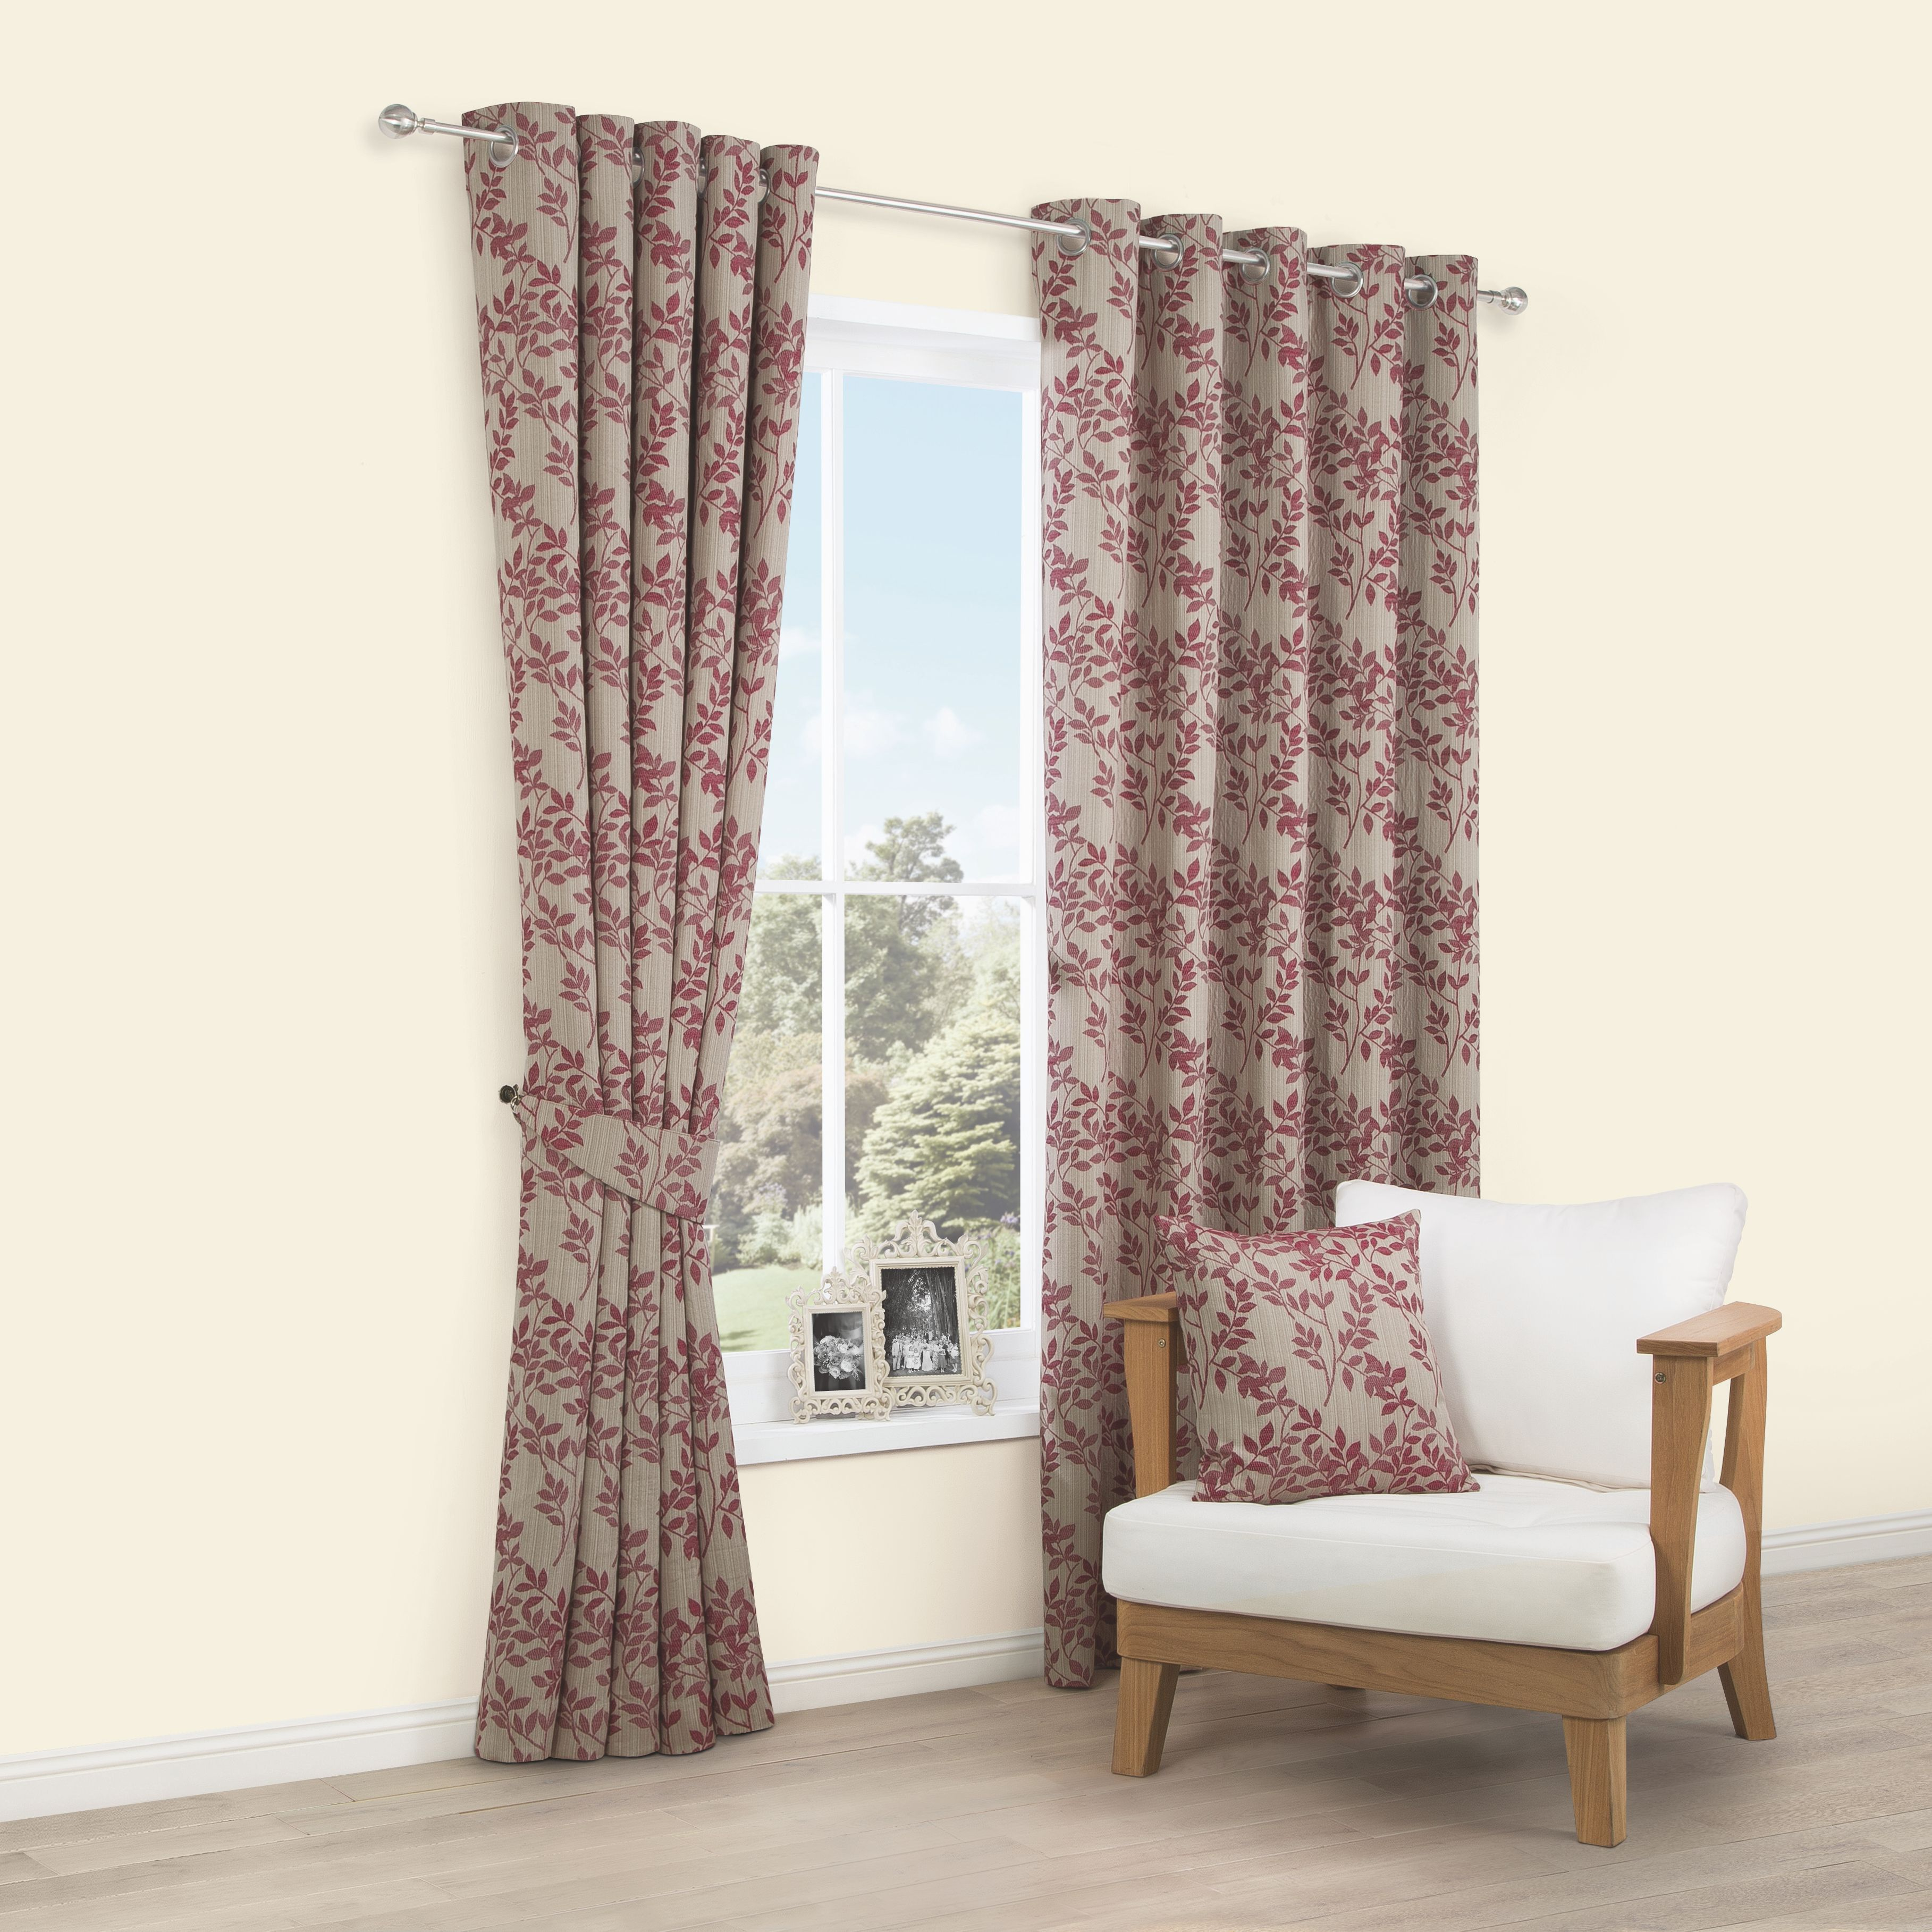 Walton Raspberry Leaves Jacquard Woven Eyelet Lined Curtains